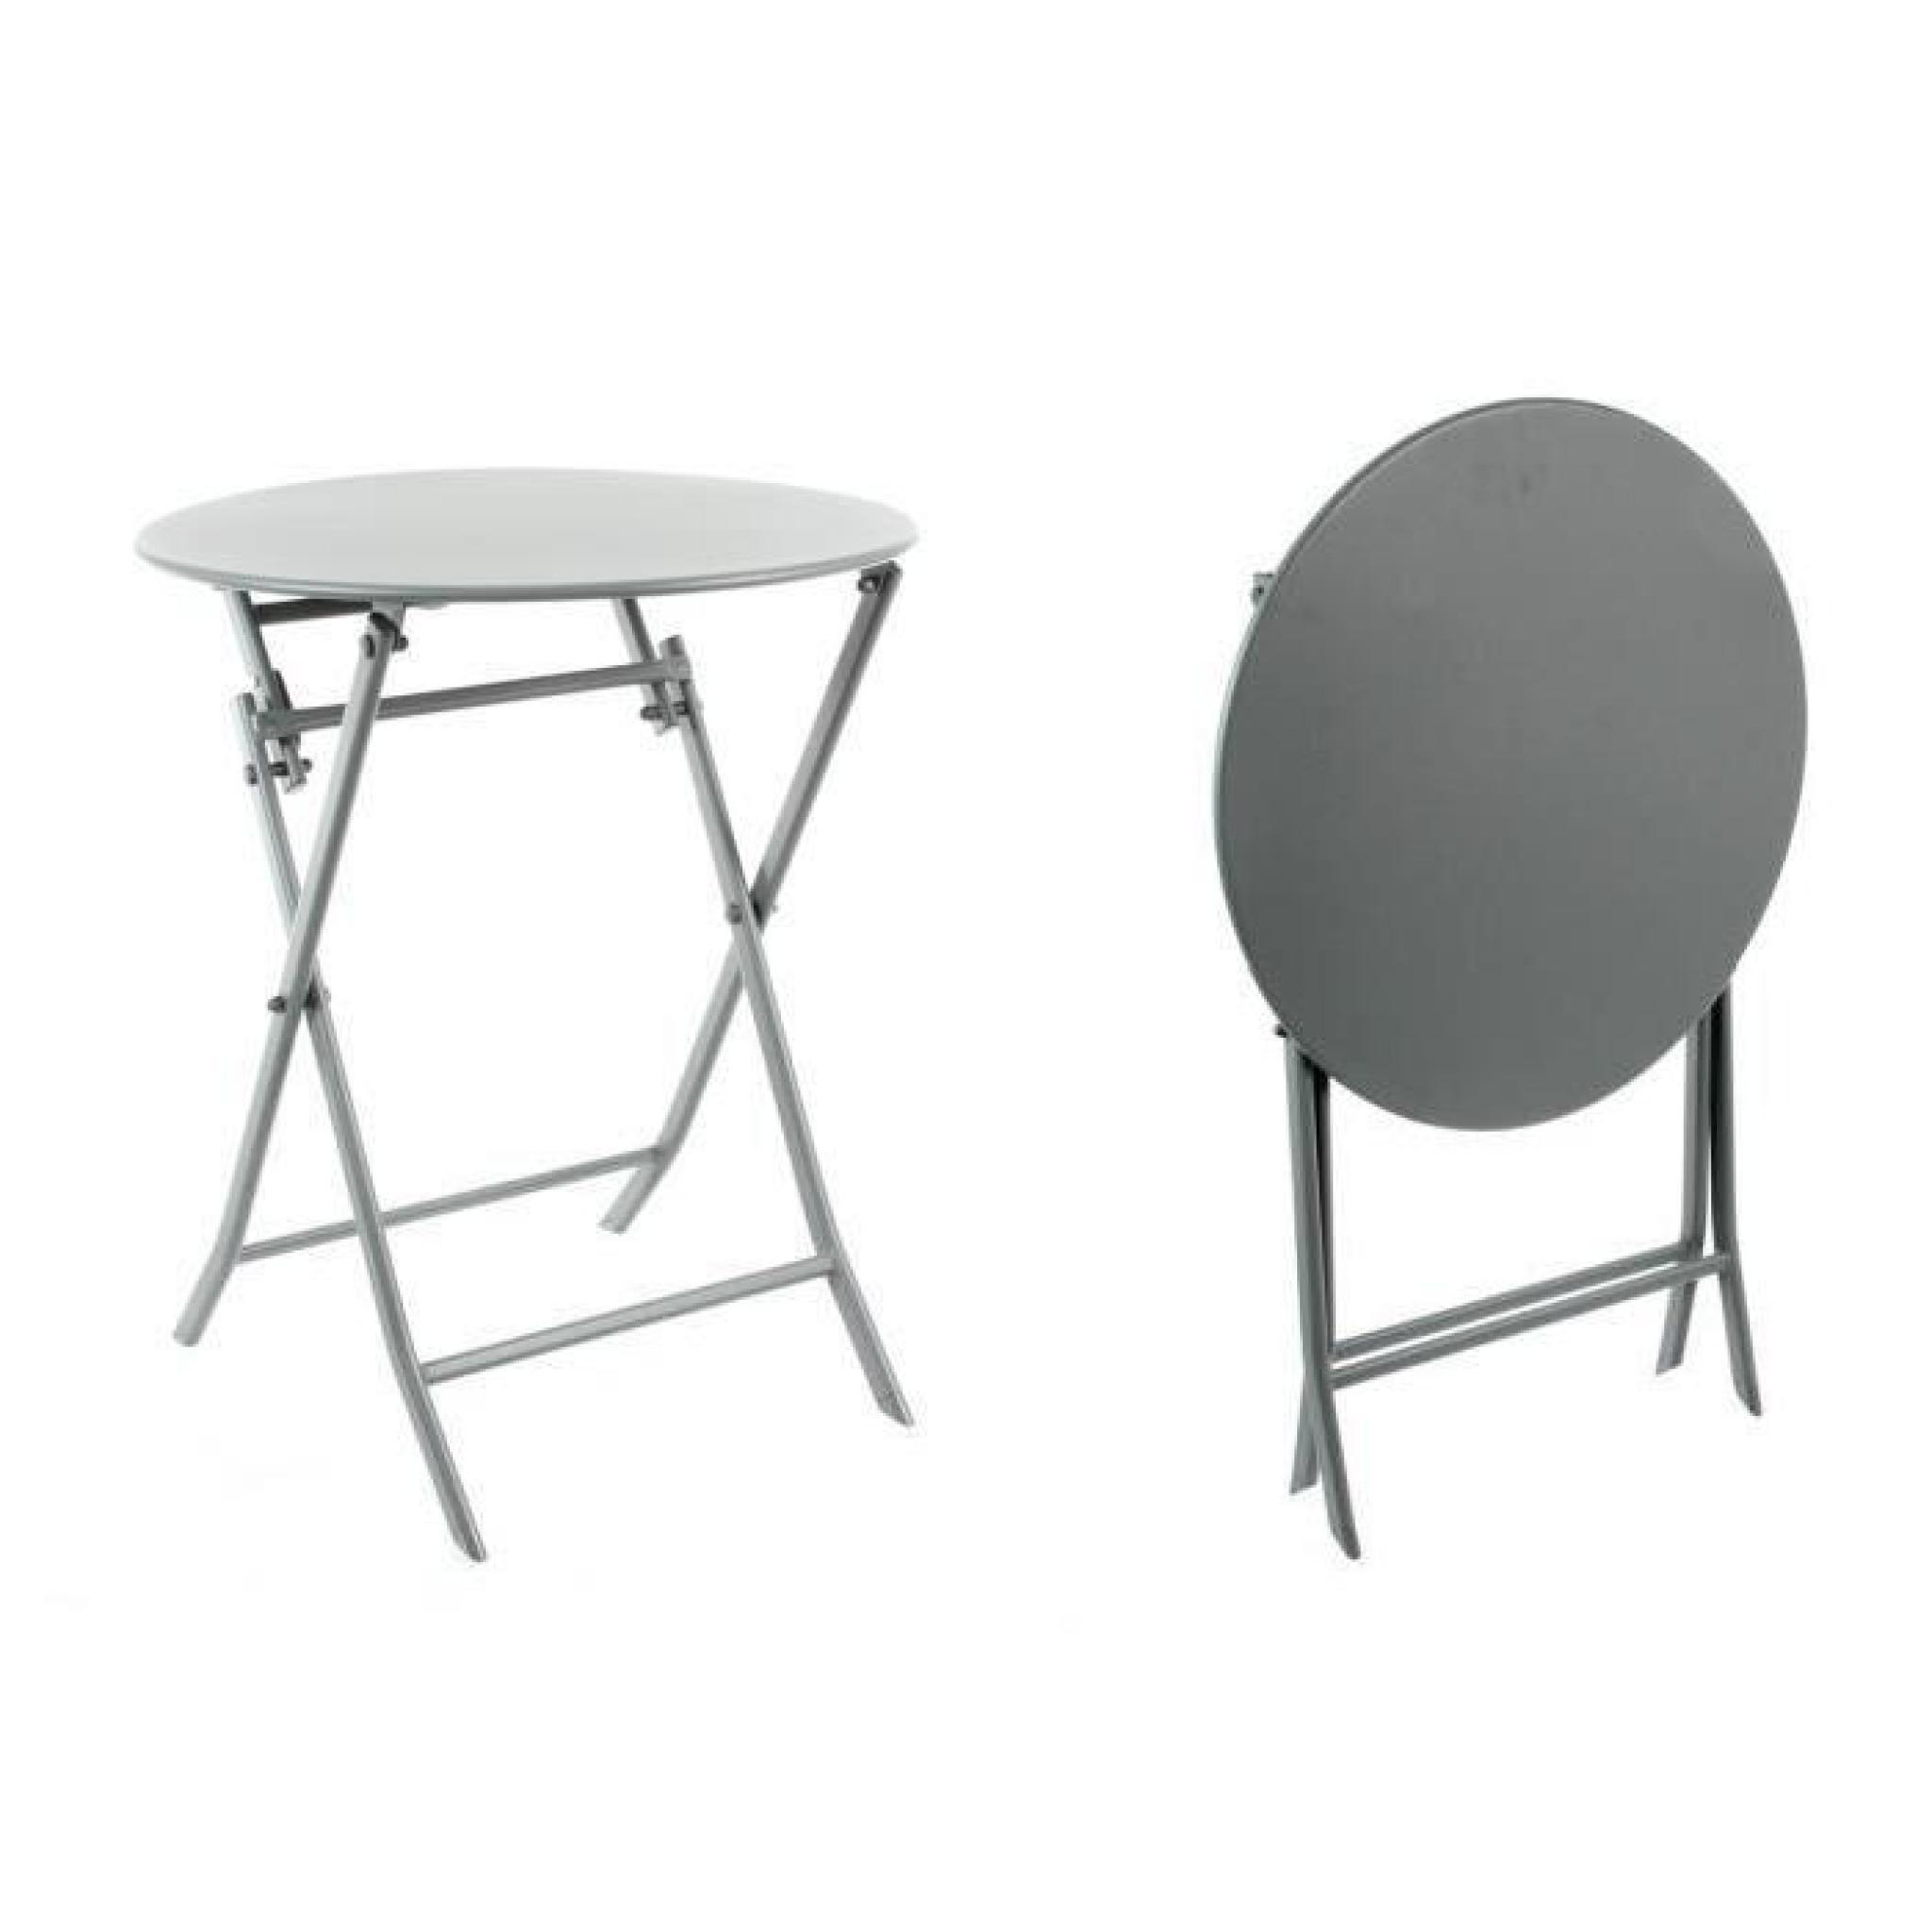 Table ronde GREENSBORO pliante Ø 60 cm ardoise Hespéride